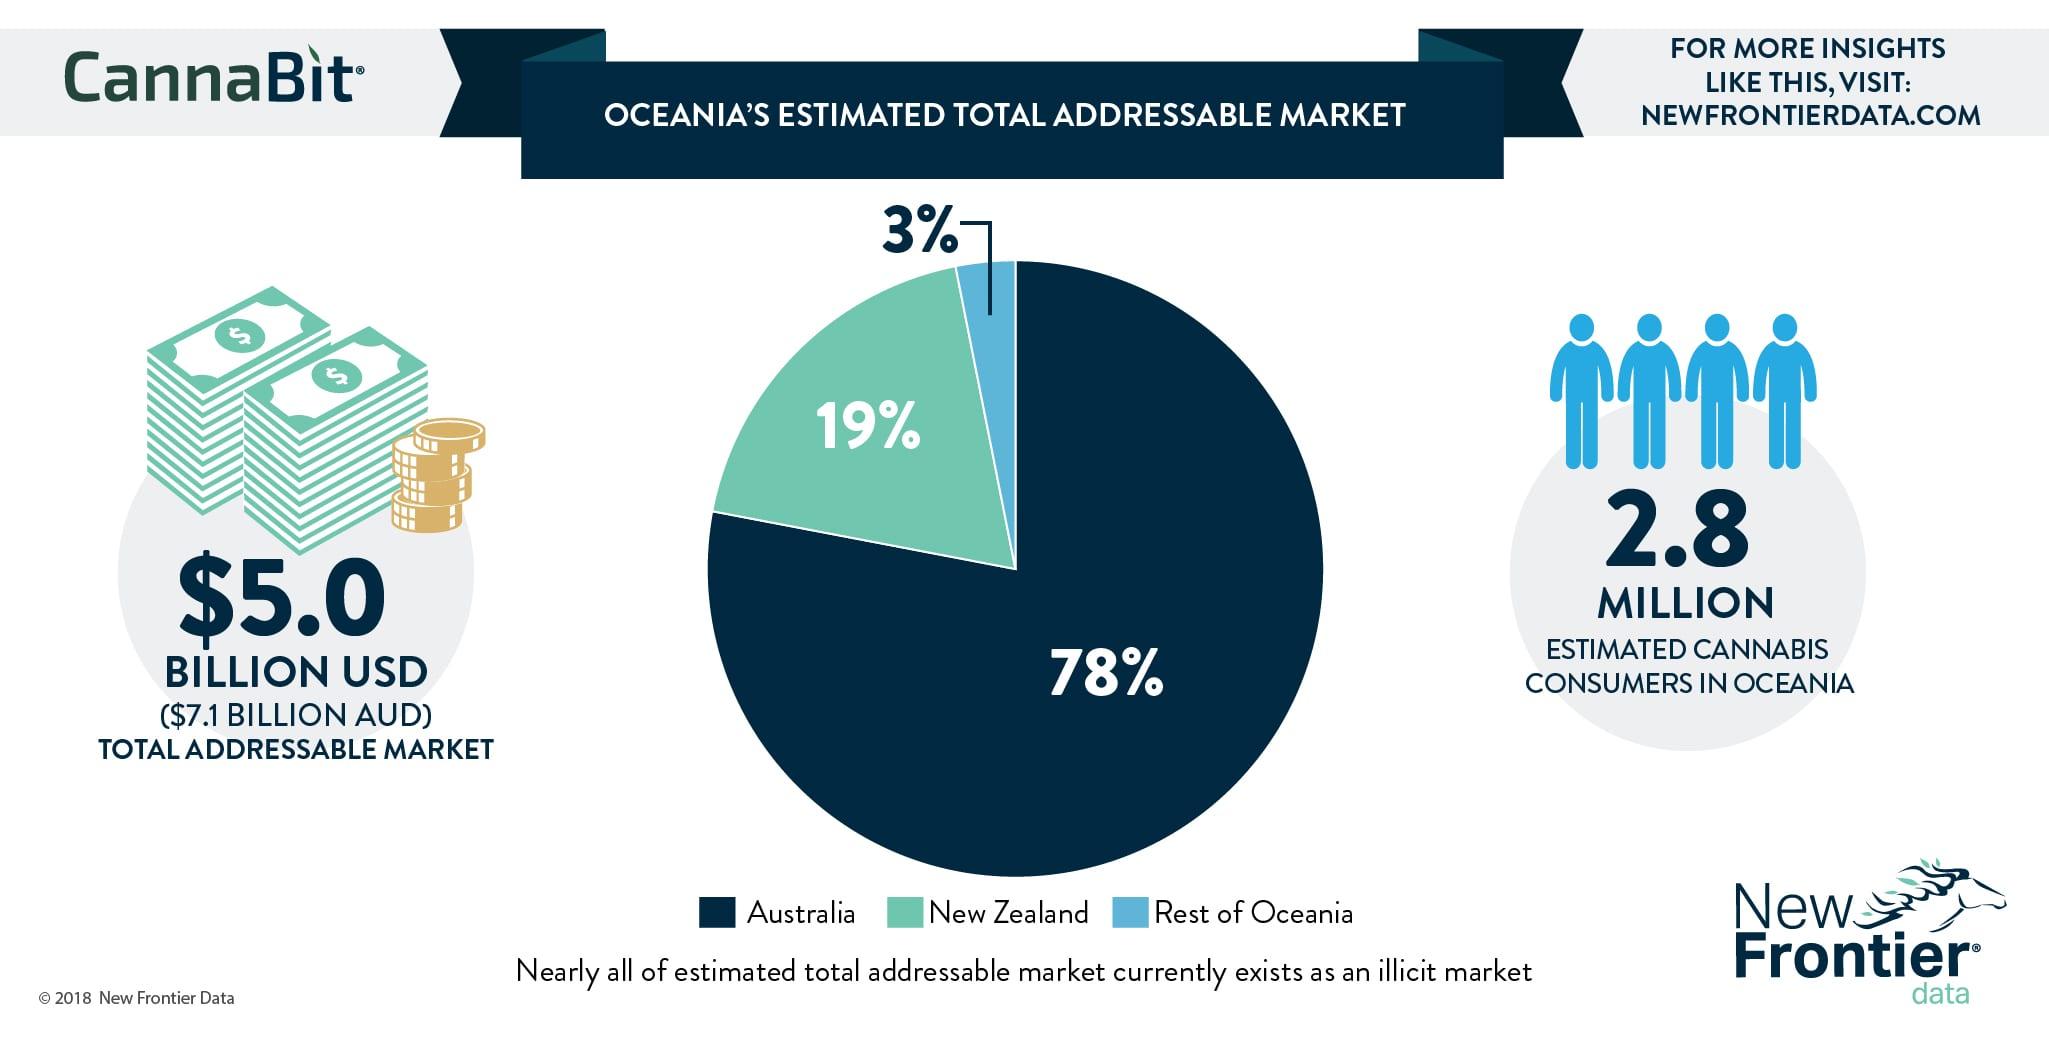 Oceanias Estimated Total Addressable Market